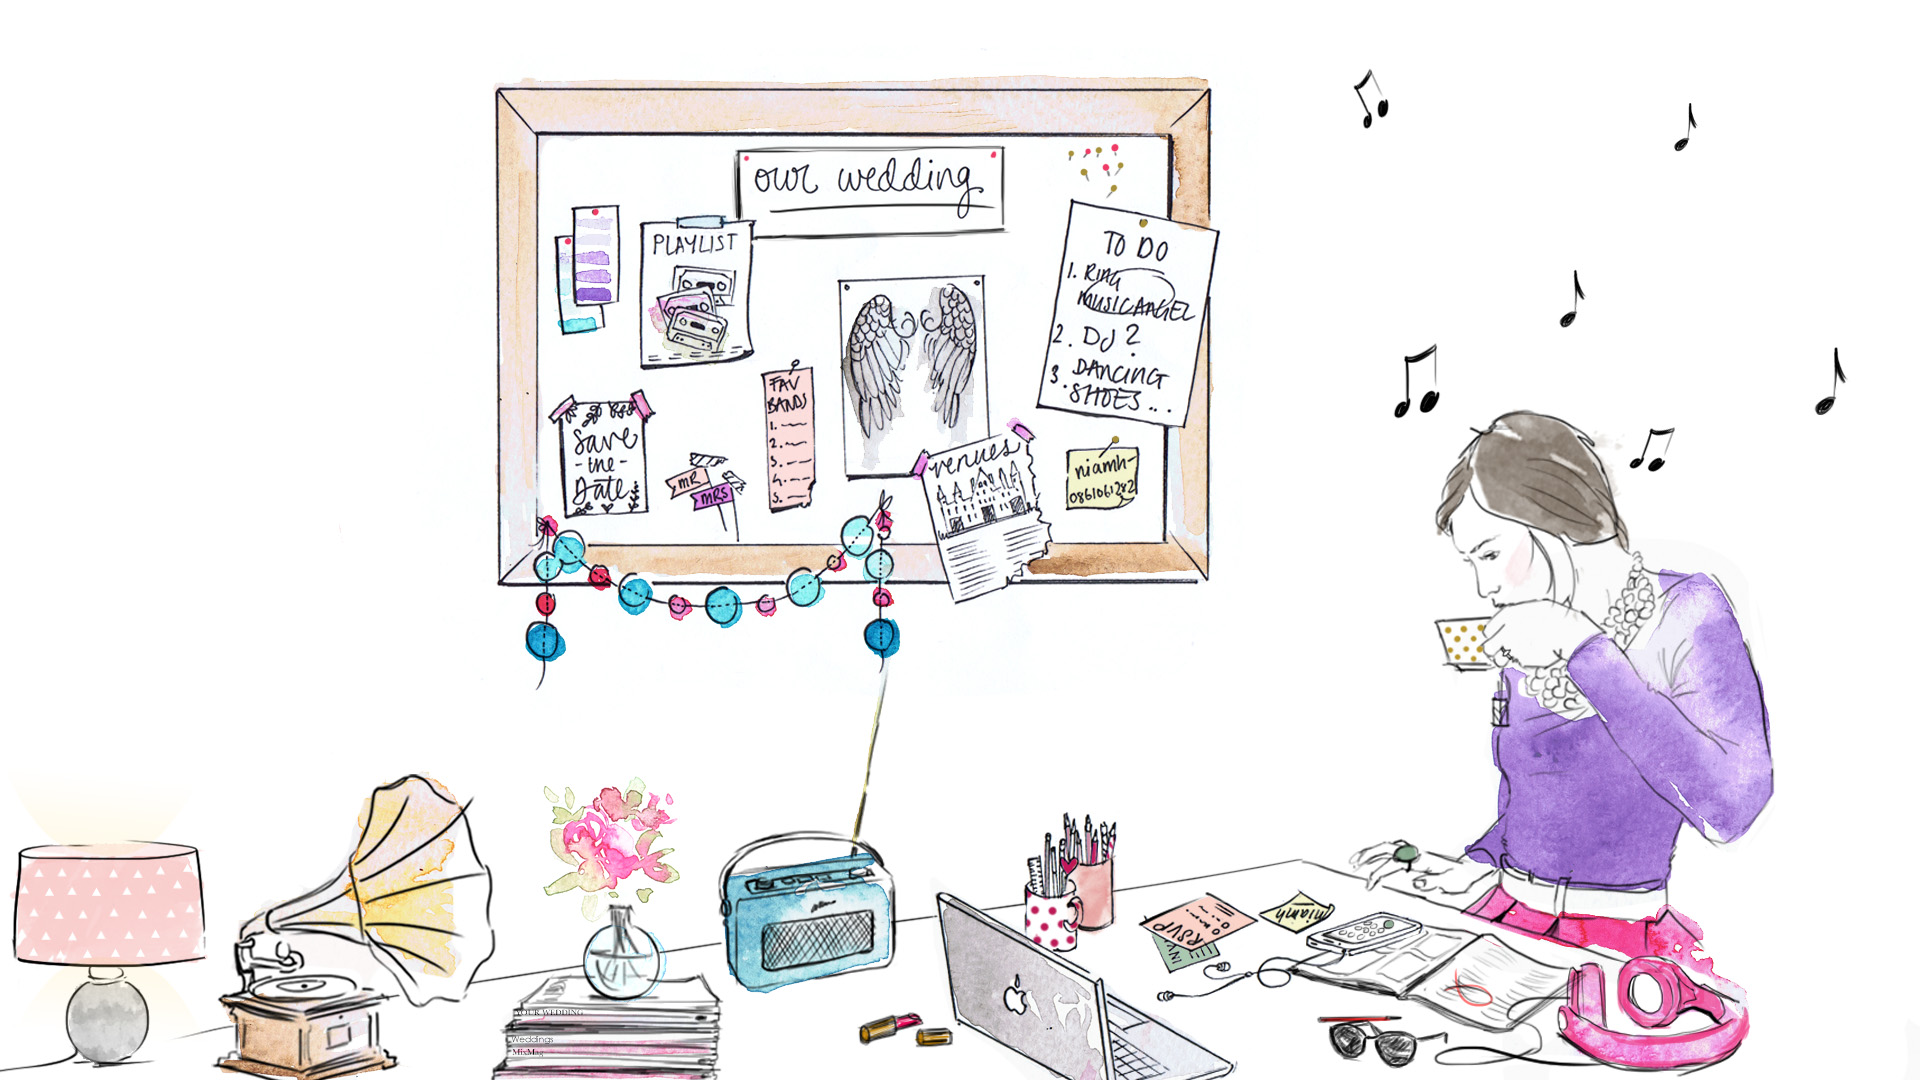 MusicAngel-homepage-nobubbles